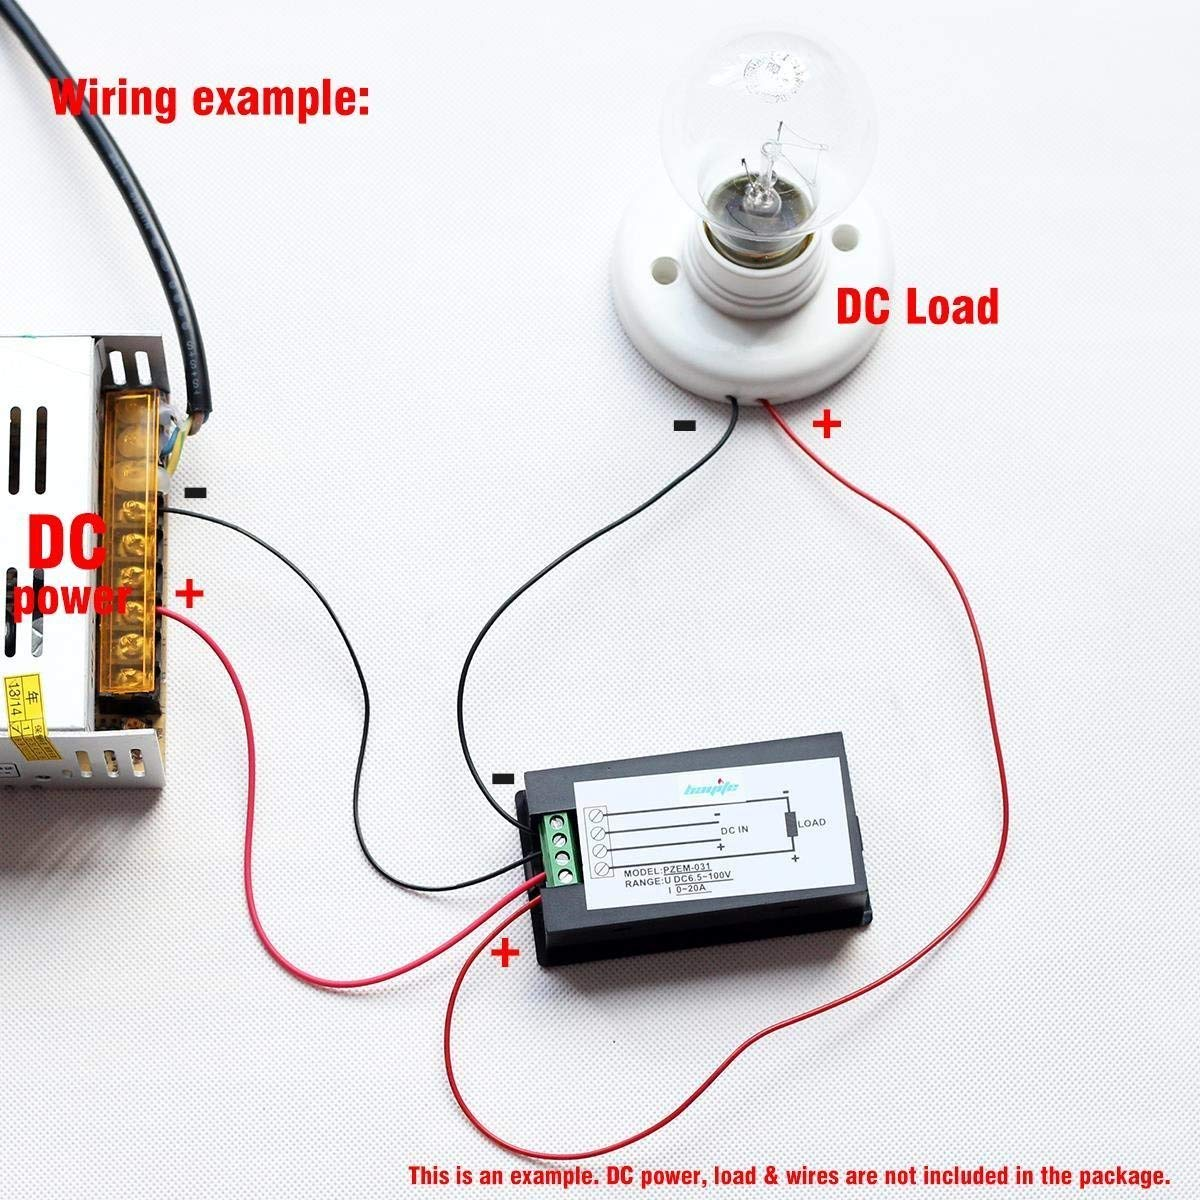 LCD Digital Display DC 6.5-100V 0-20A Voltmeter/ Power Meter/ Electric Power Monitor Bulit-in Shunt